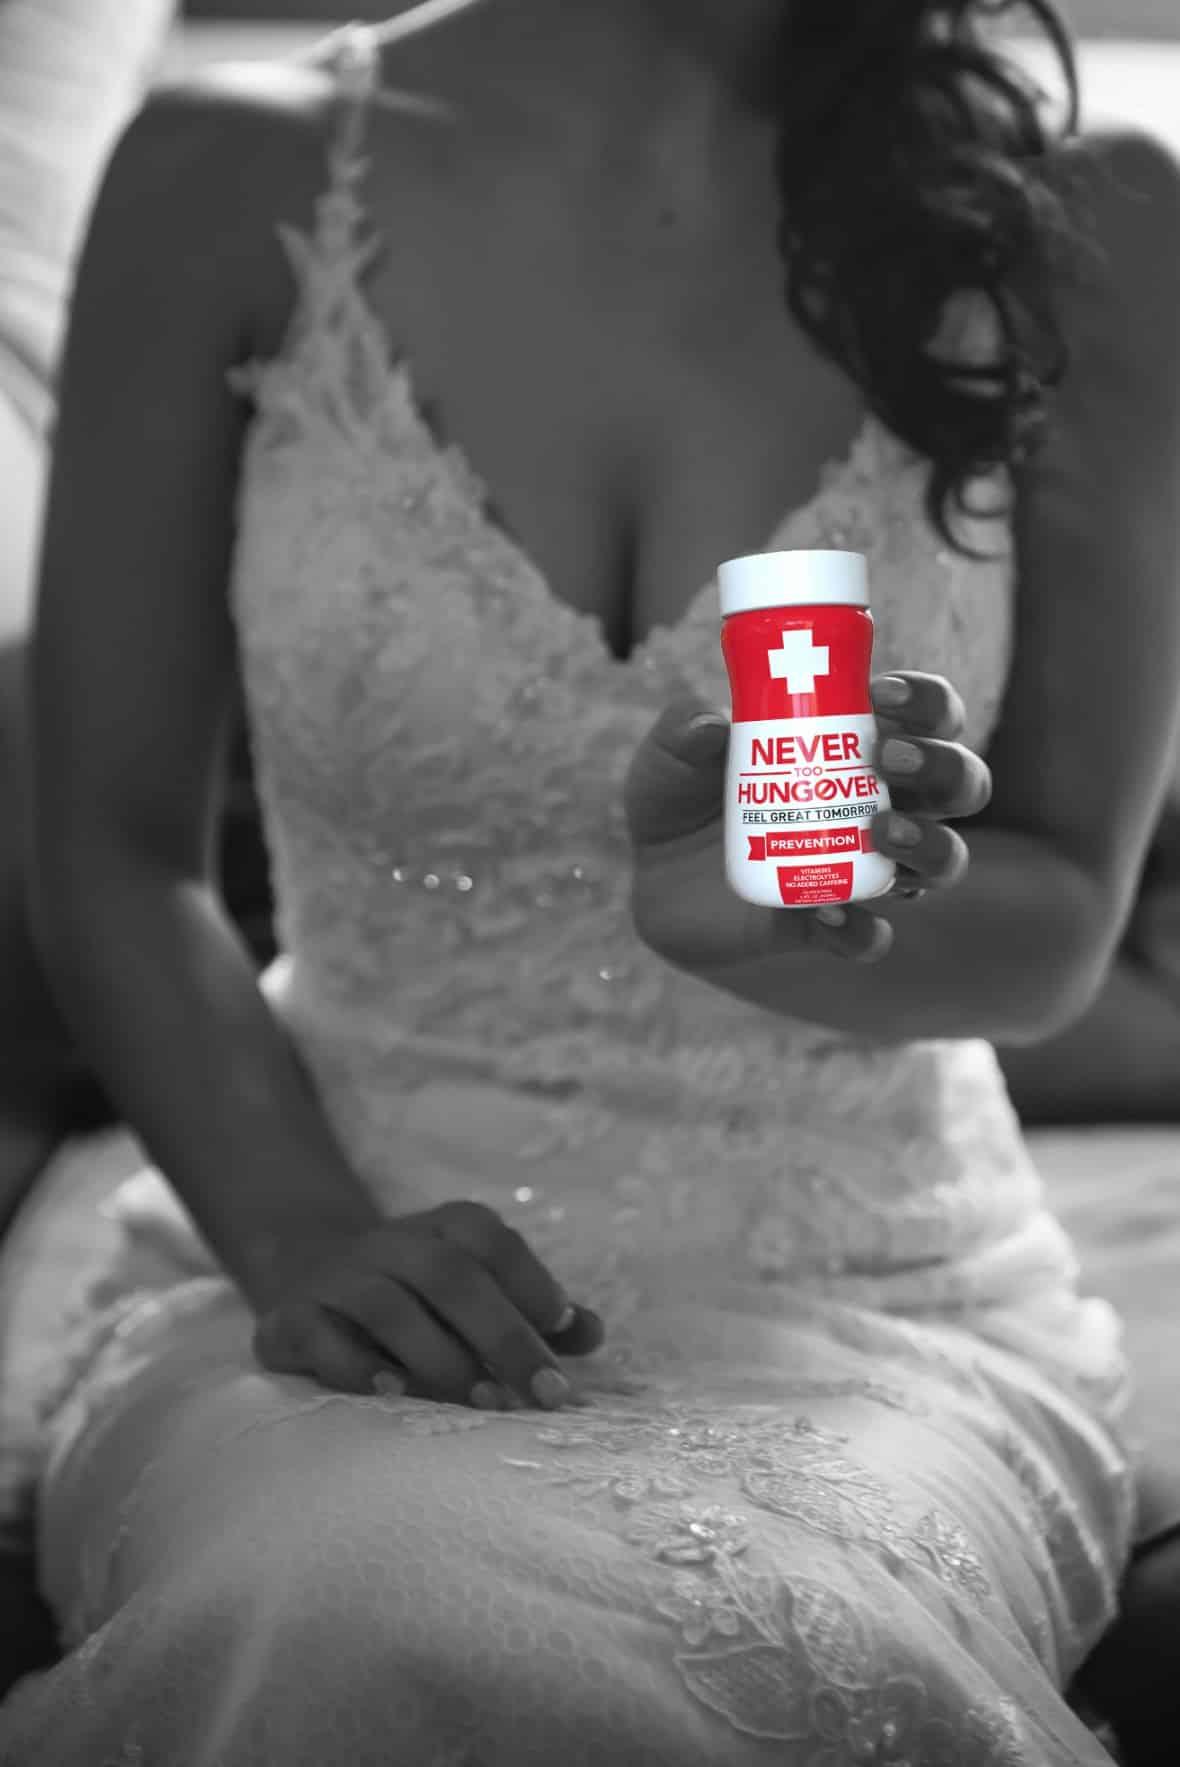 Never Too Hungover - Prevent Wedding Hangovers